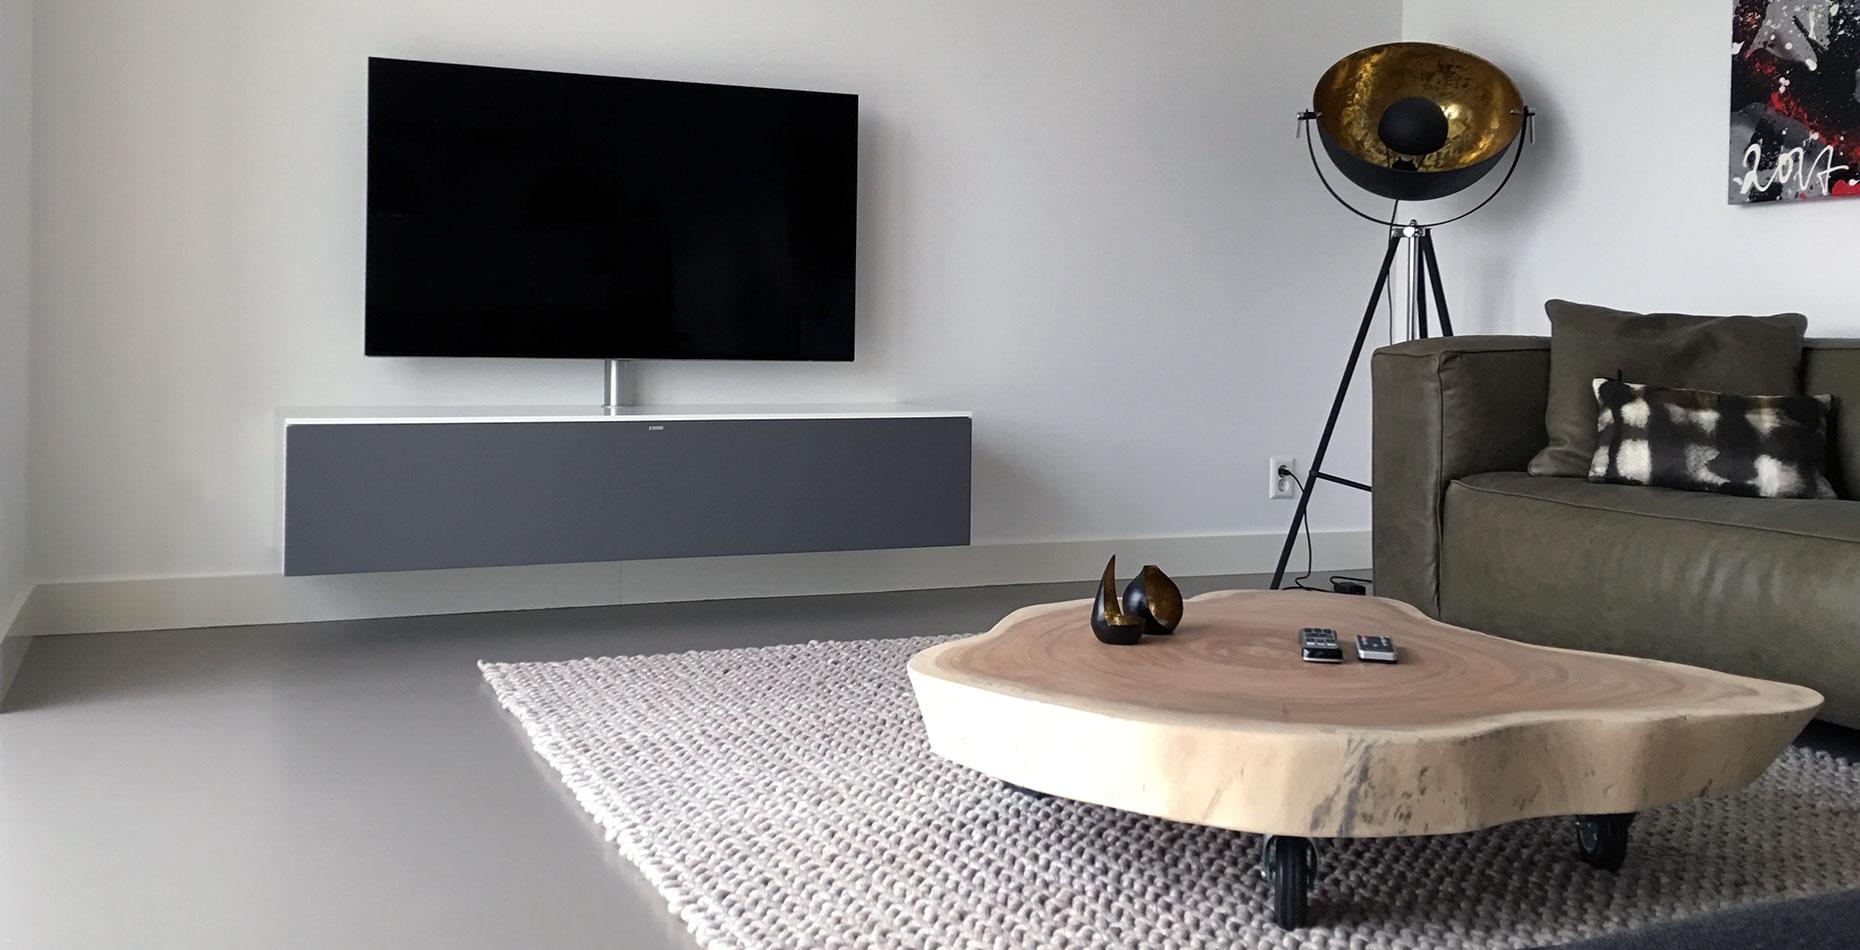 Design Tv Kast : Tv meubel kast goedkoop design tv kast beste exclusief